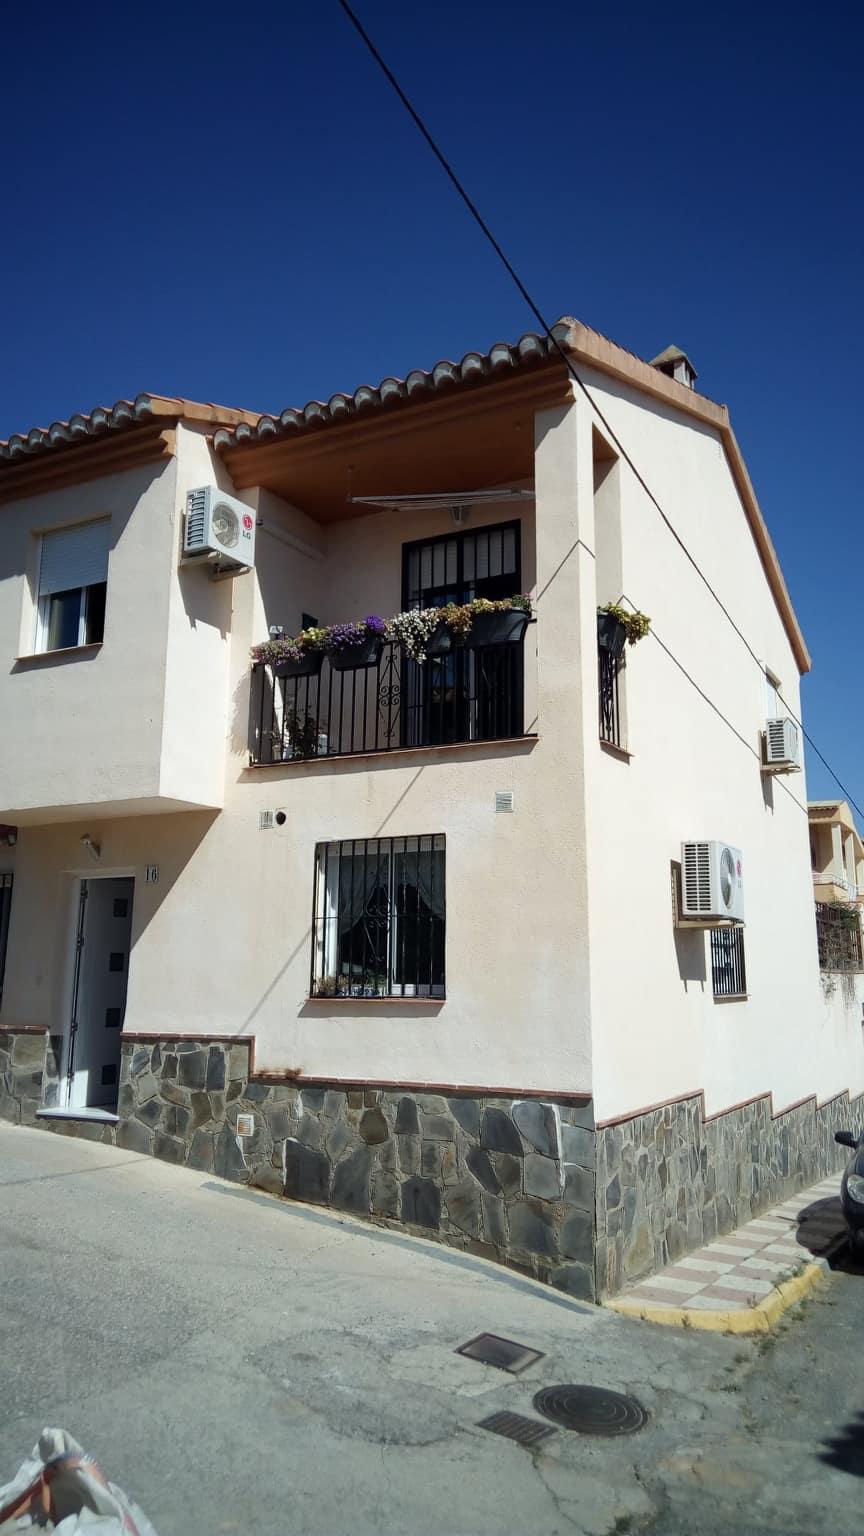 Detached TownHouse For Sale in Otura Granada Spain